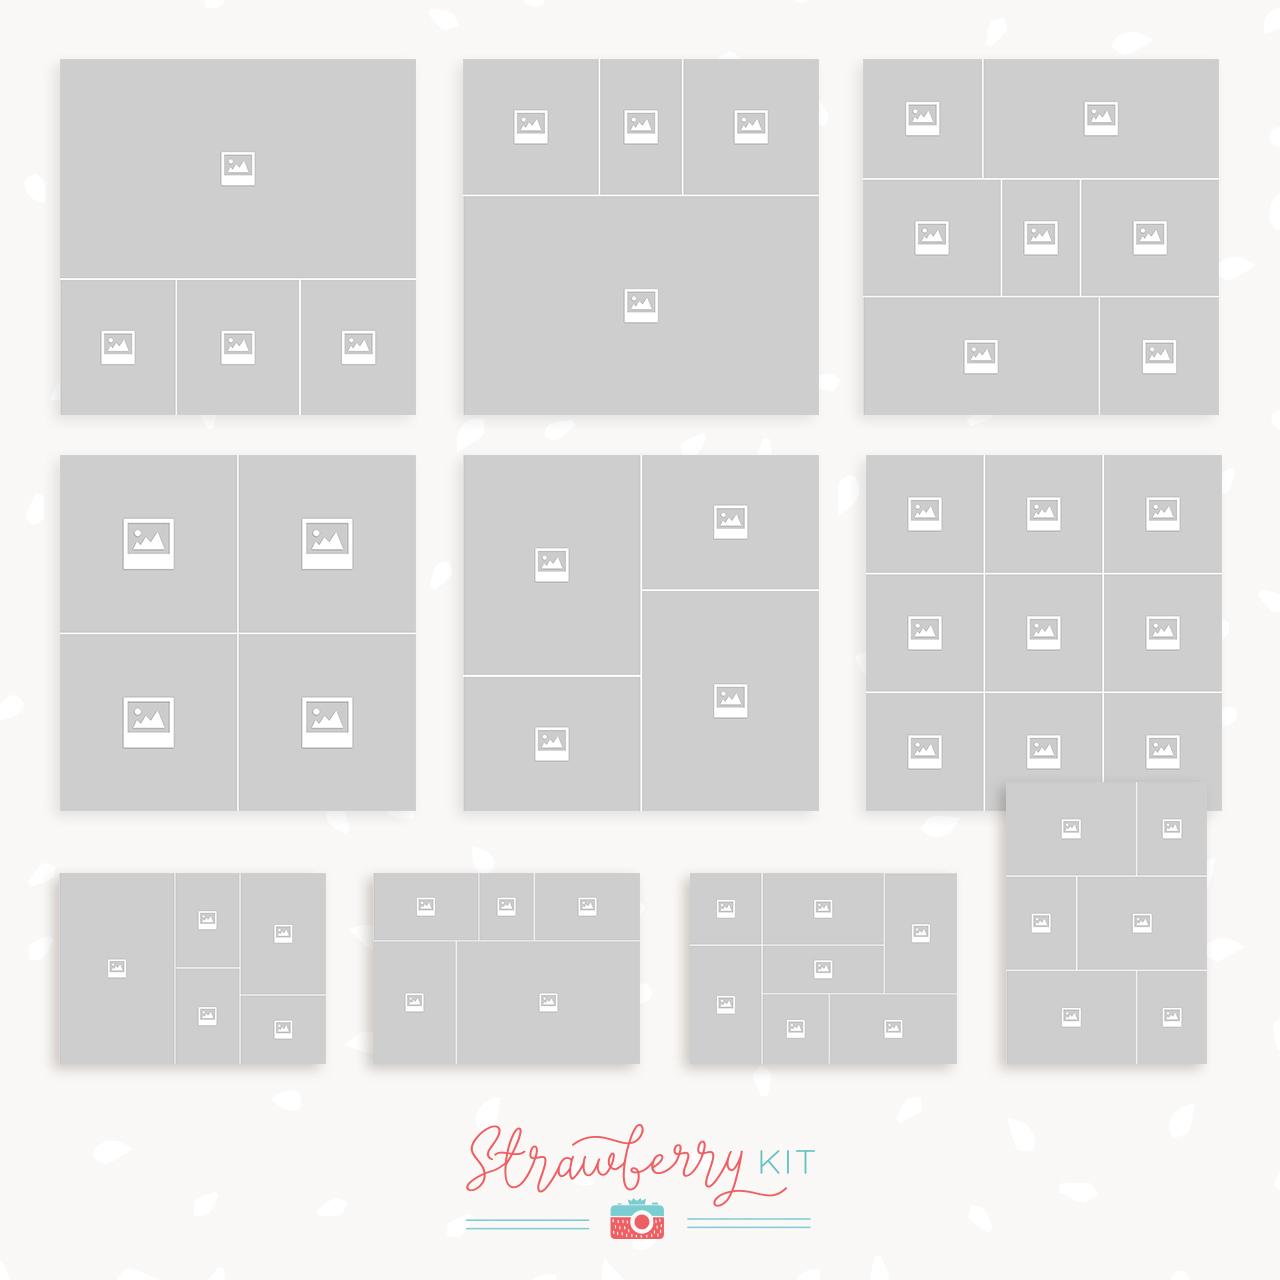 storyboard template bundle strawberry kit